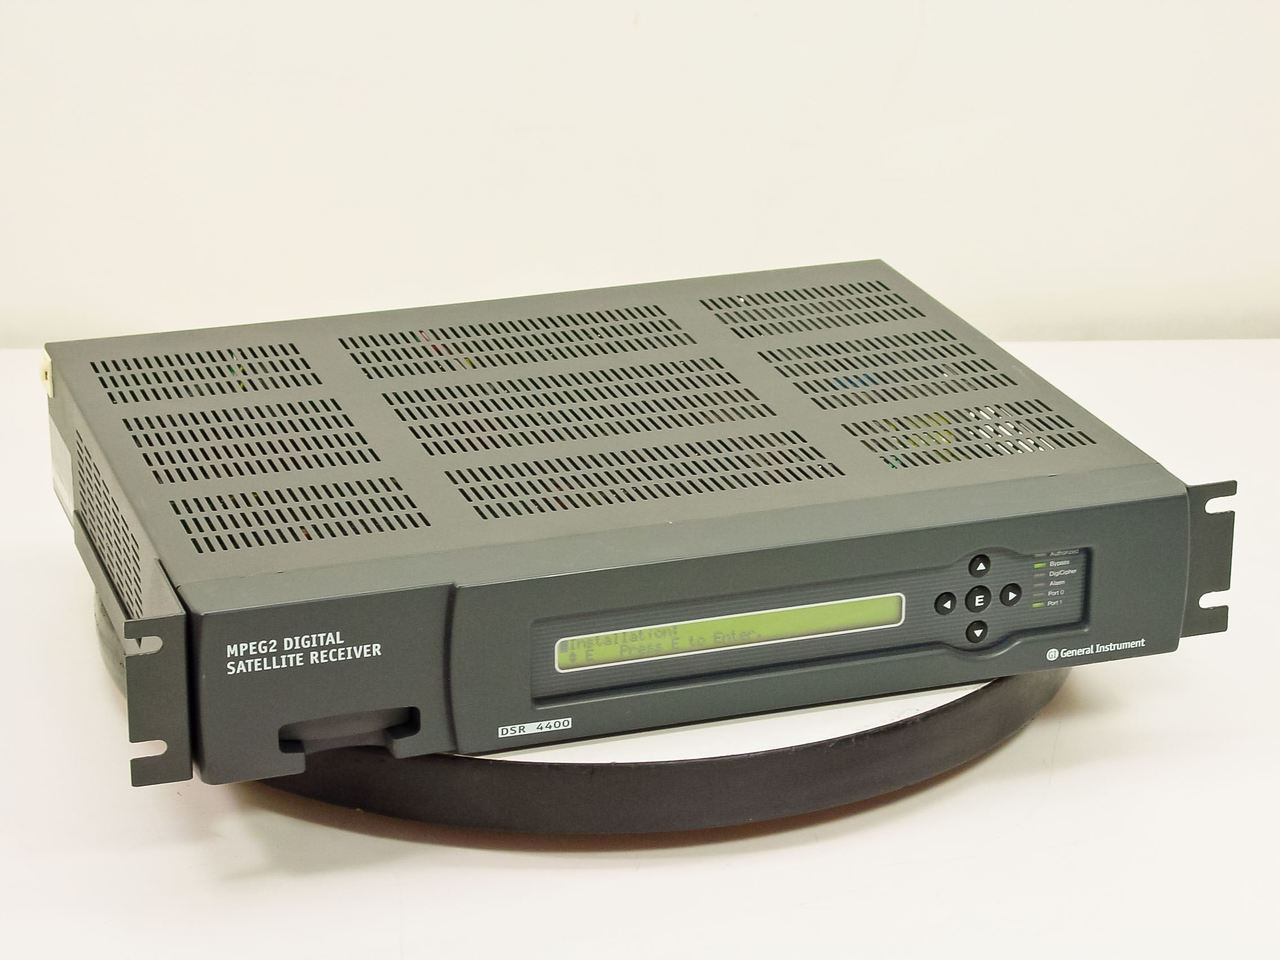 General Instrument DSR4400 MPeg2 Digital Satellite Receiver | RecycledGoods.com